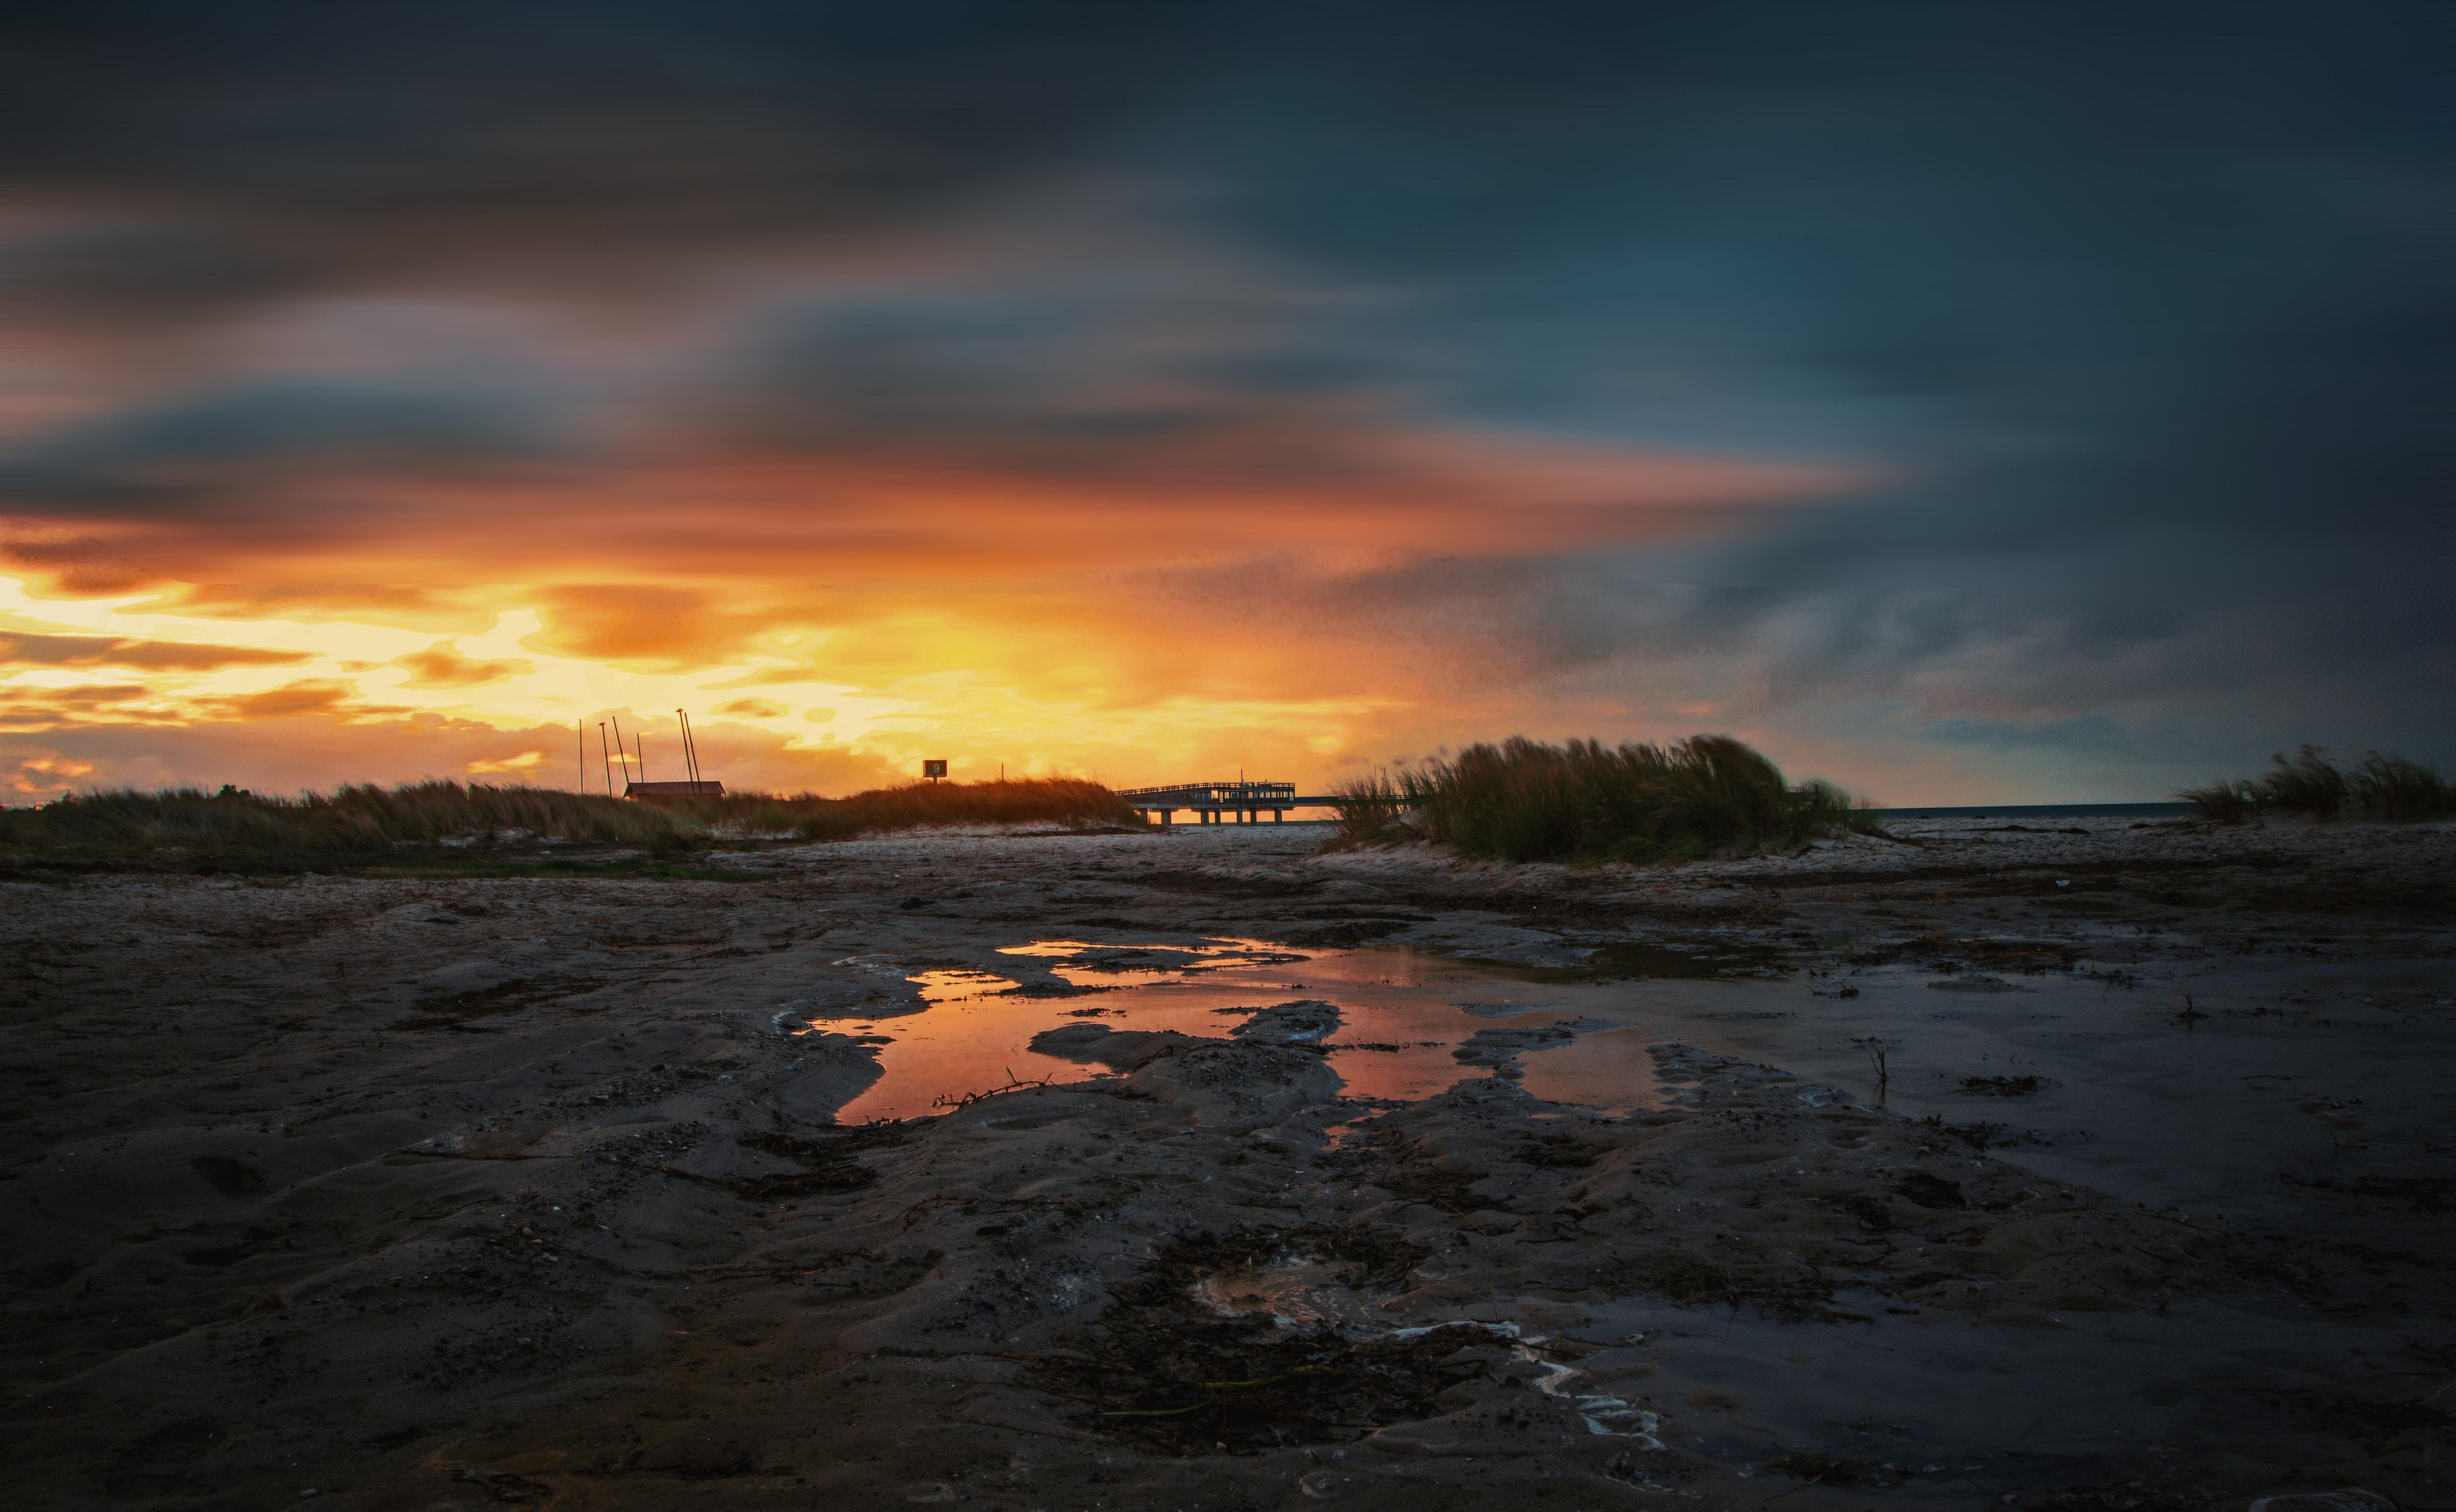 sunset over plains